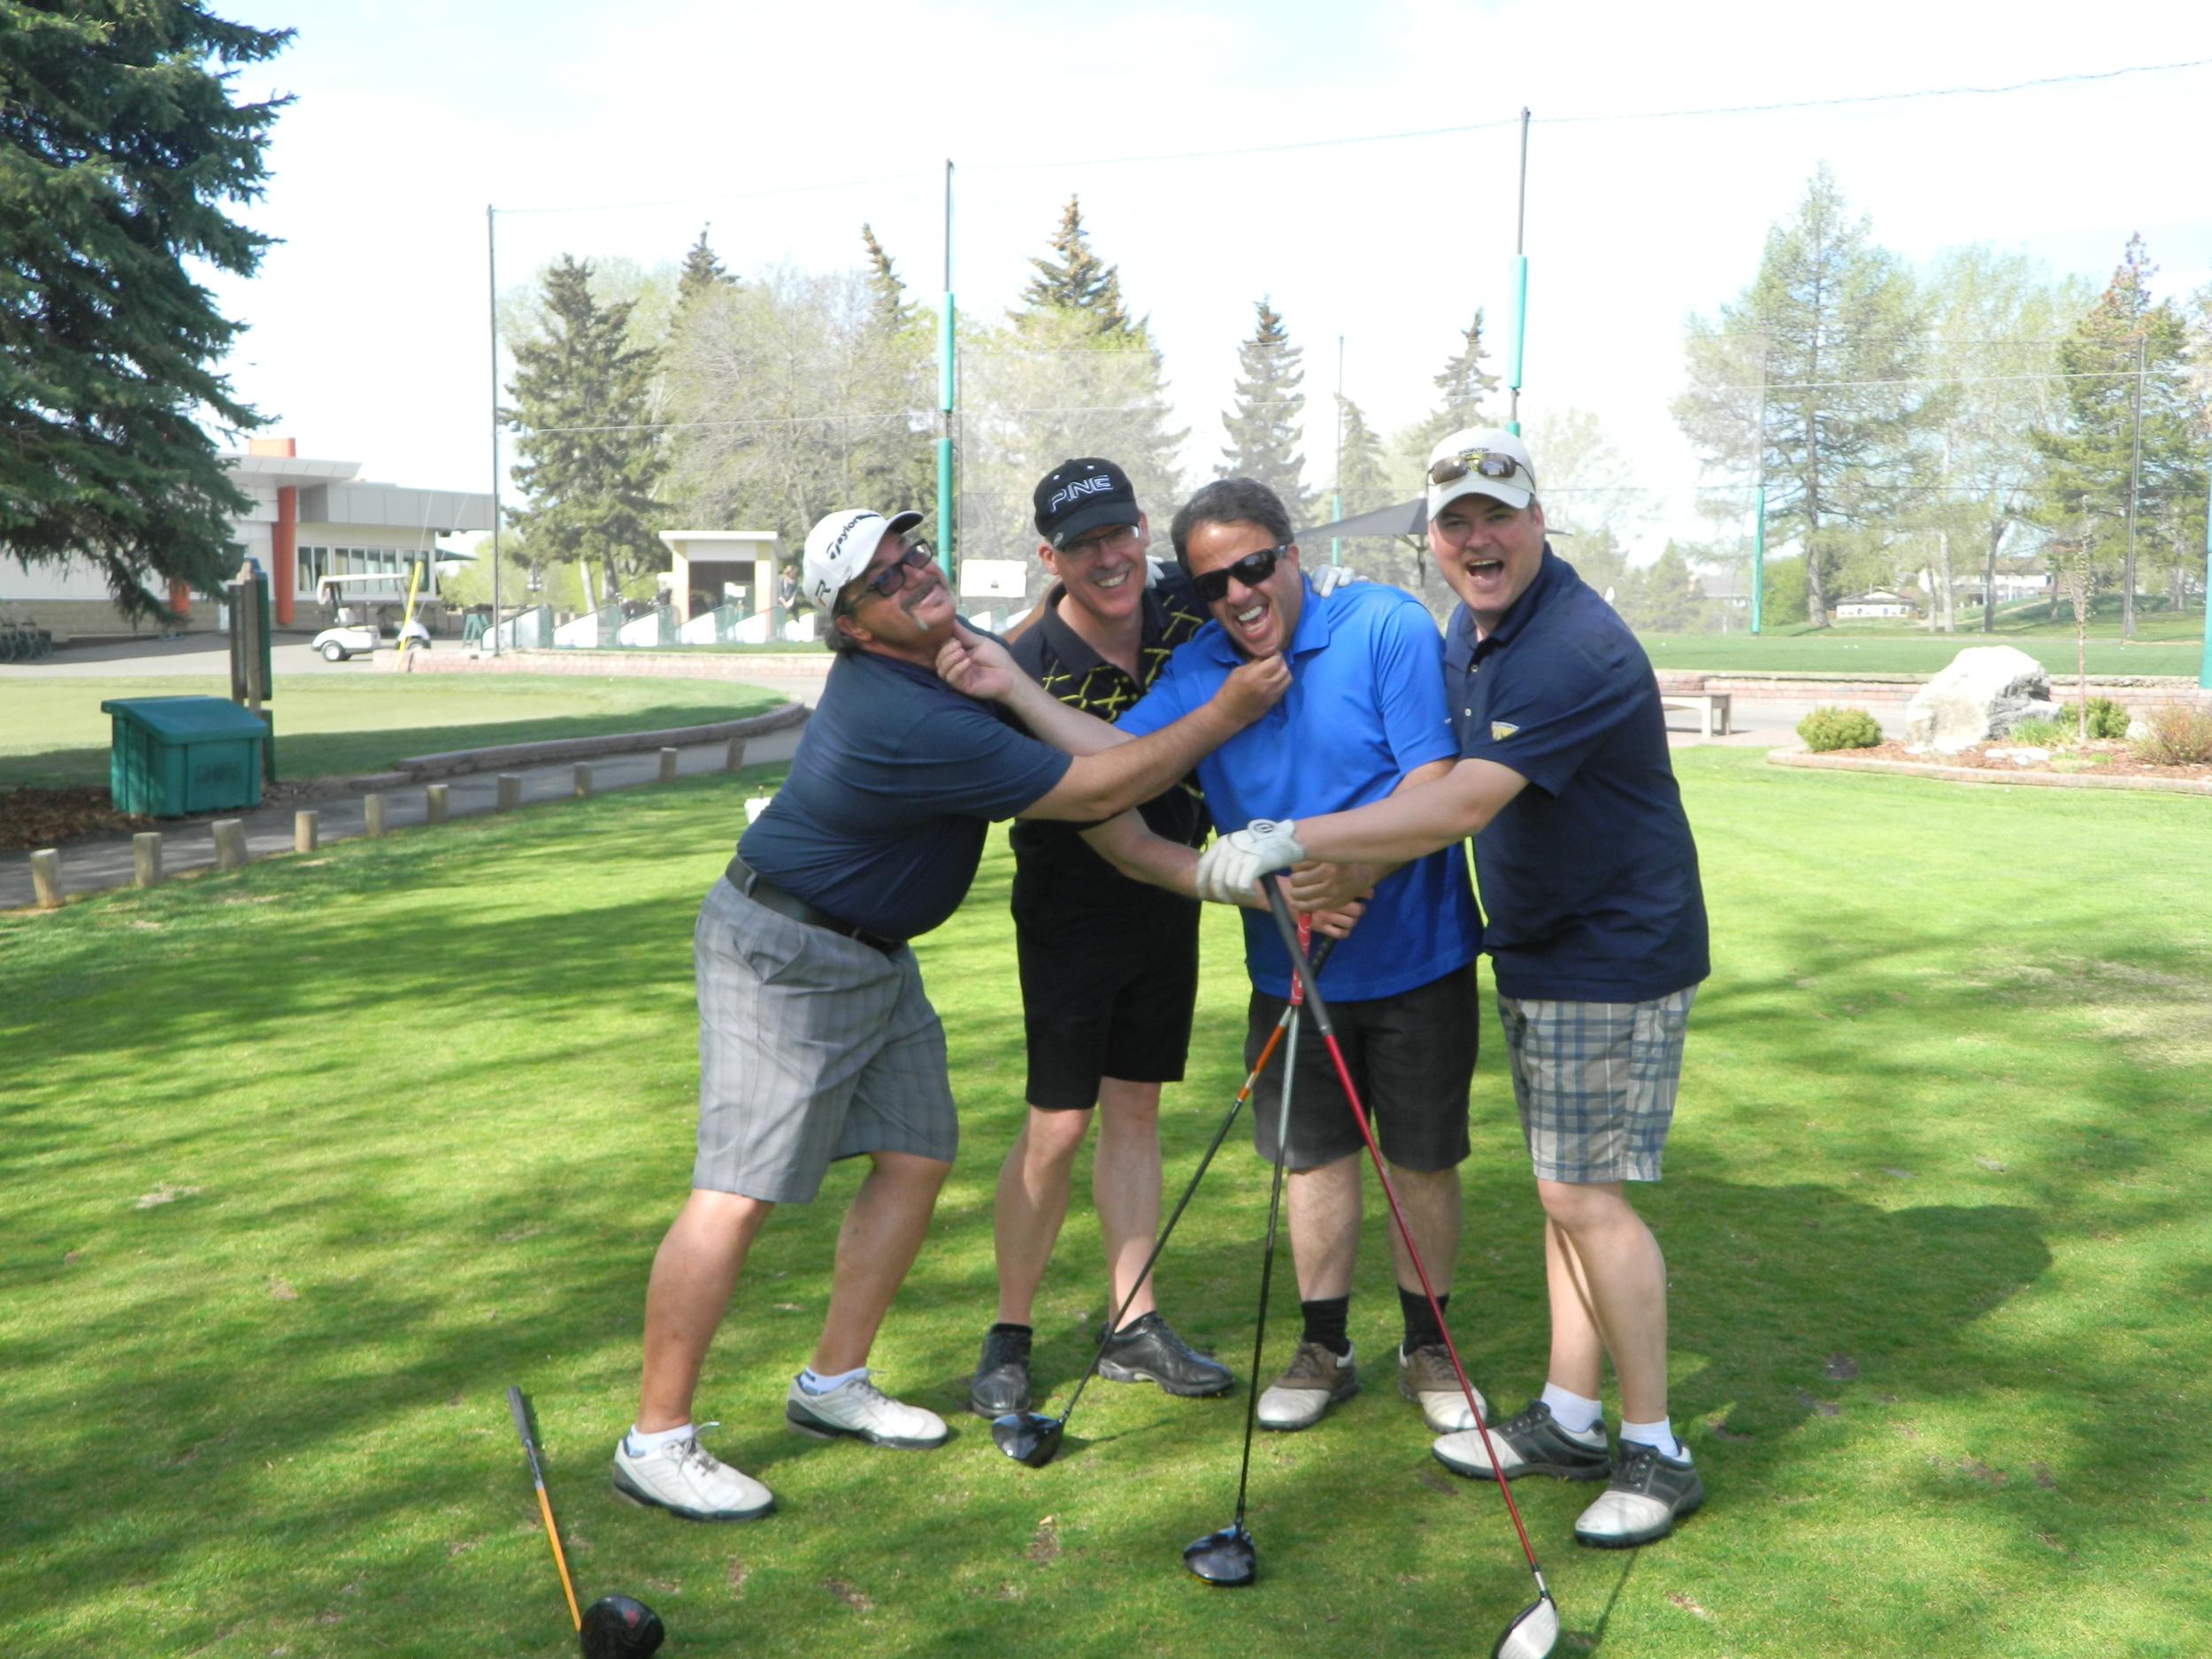 204 golfer pictures 008.jpg